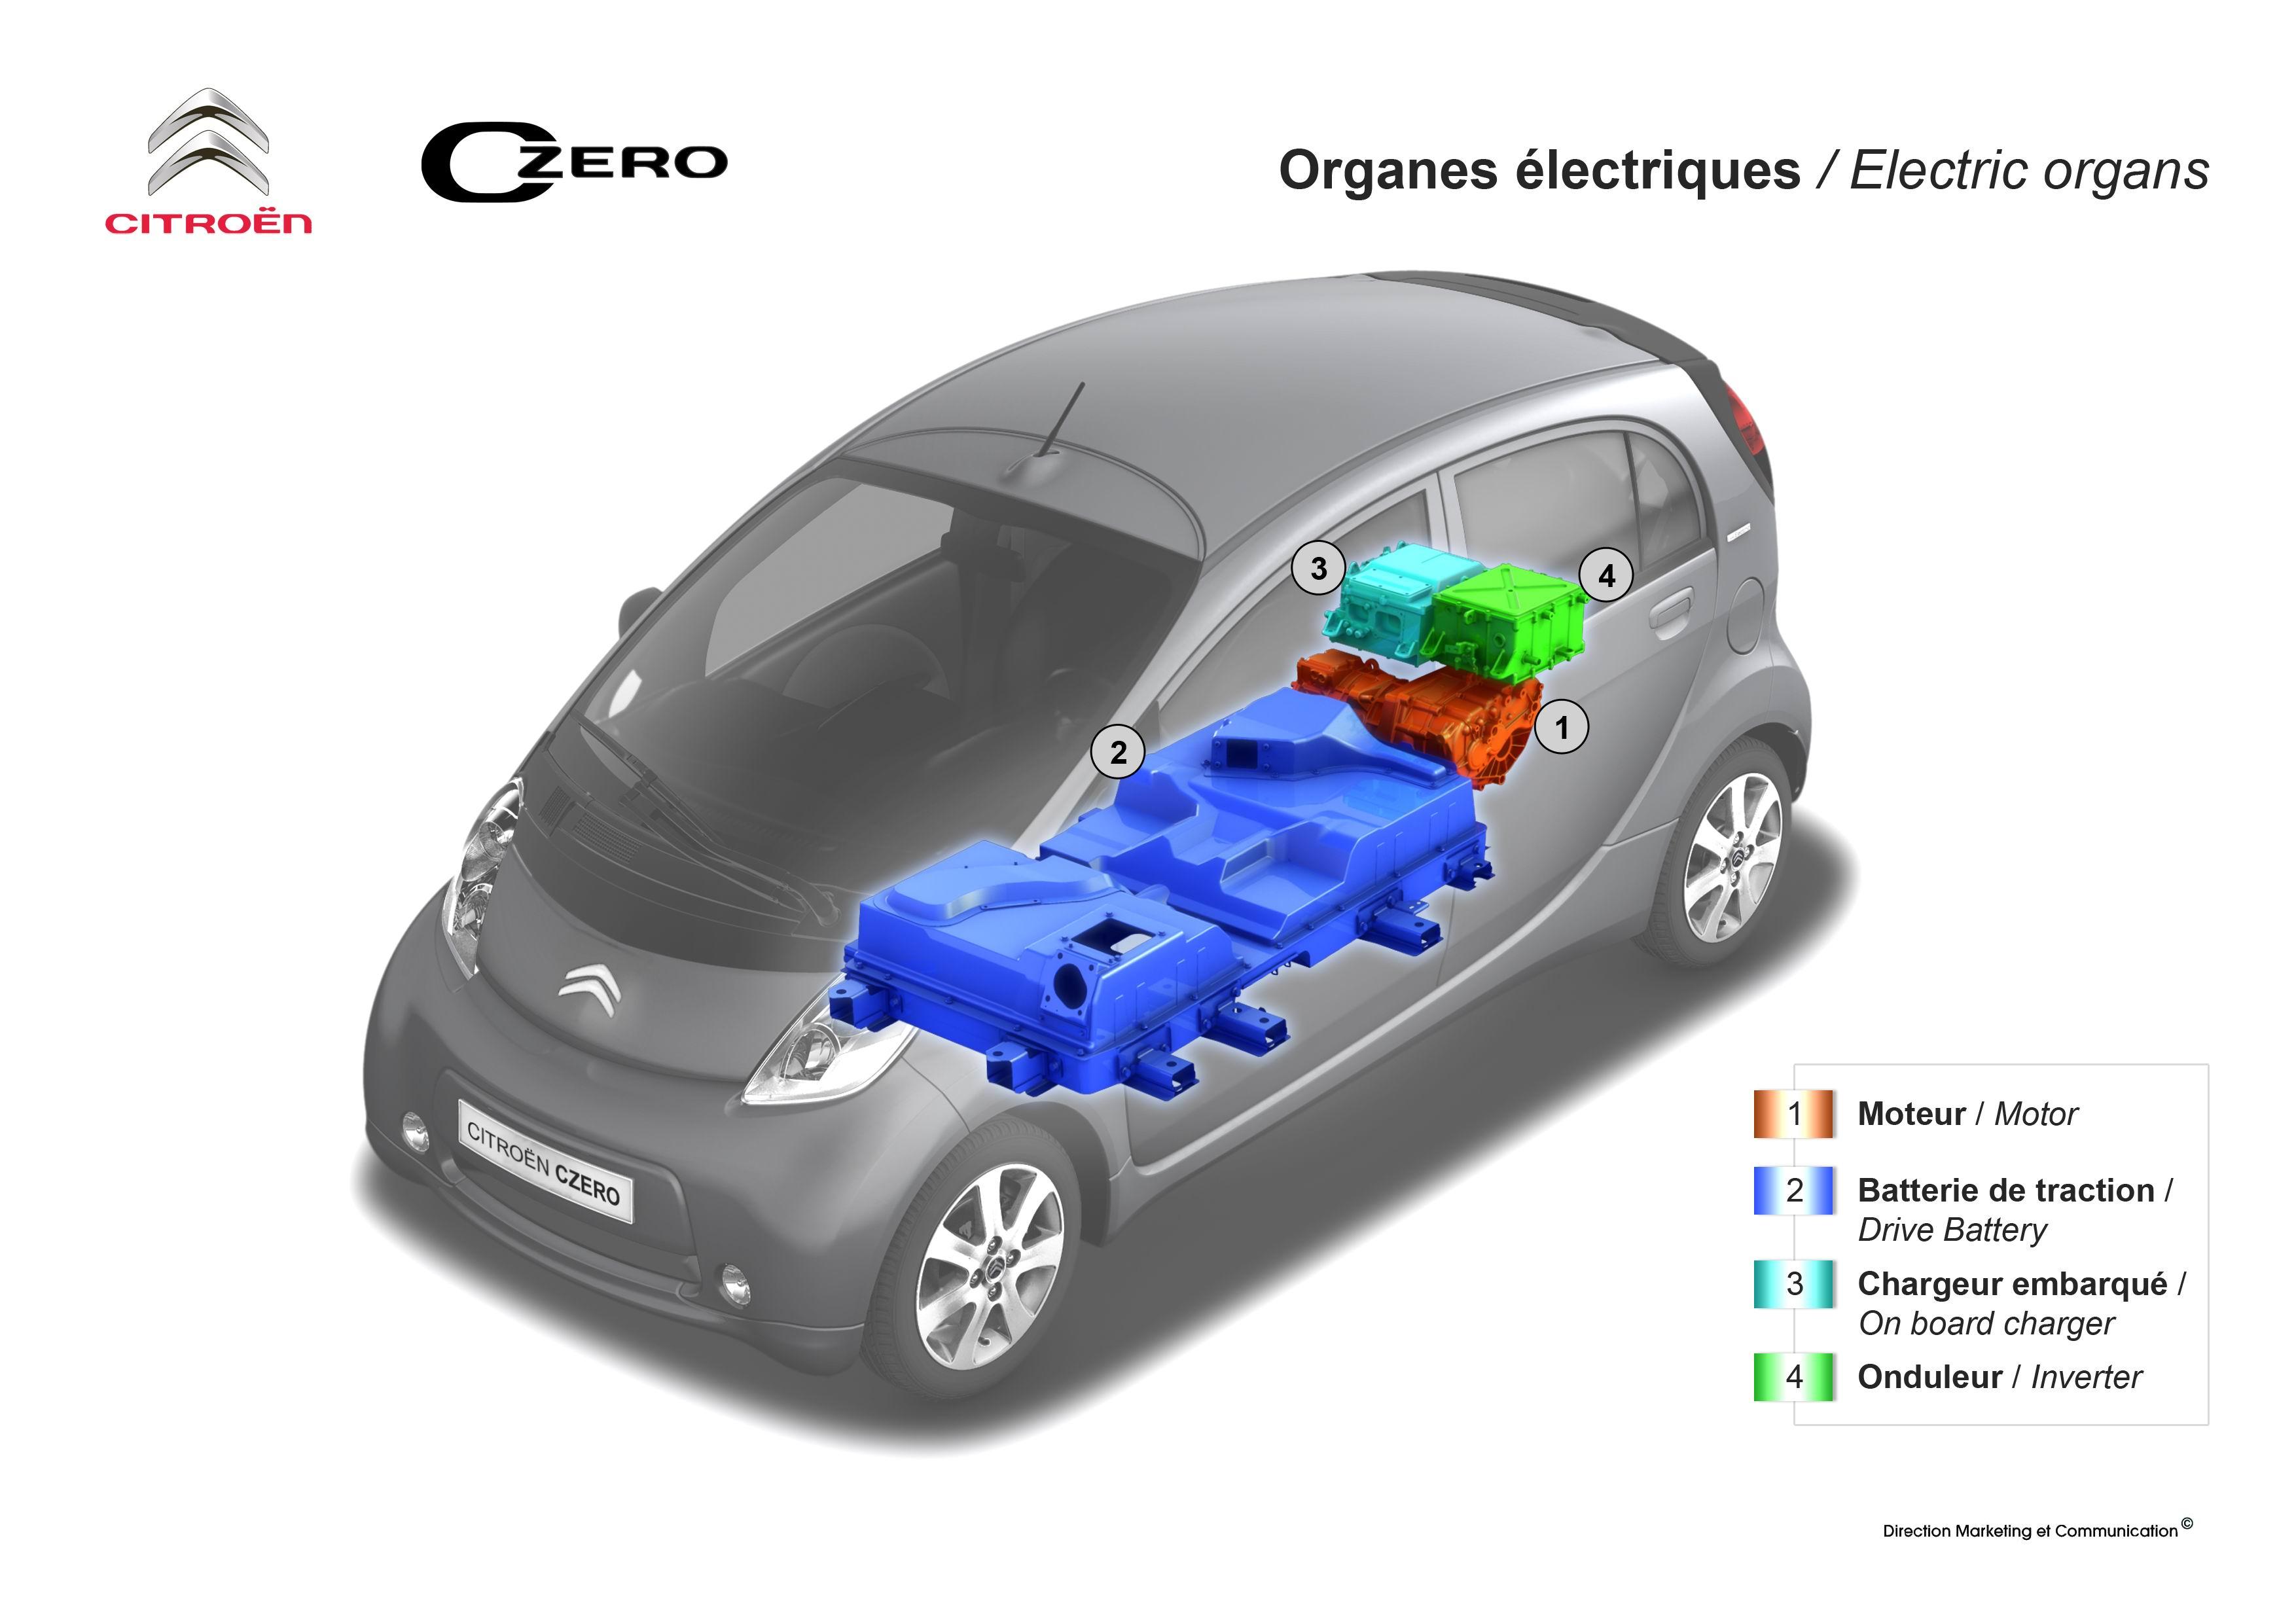 Großartig Elektroauto Schaltplan Galerie - Verdrahtungsideen ...